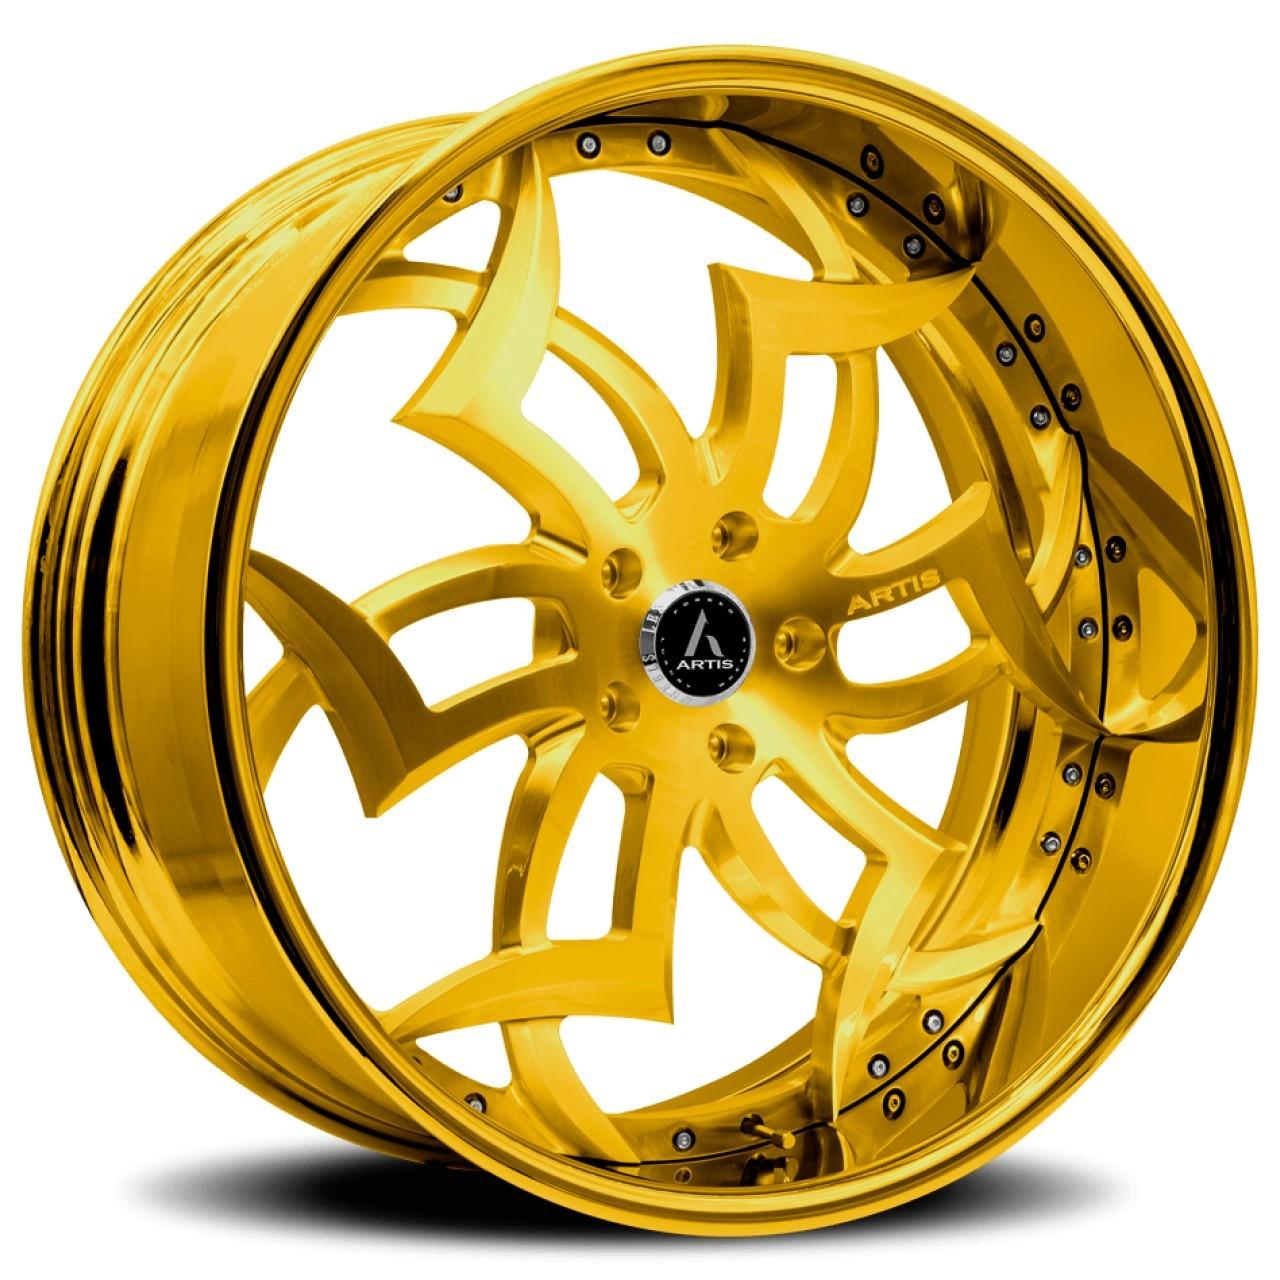 Artis Medusa forged wheels